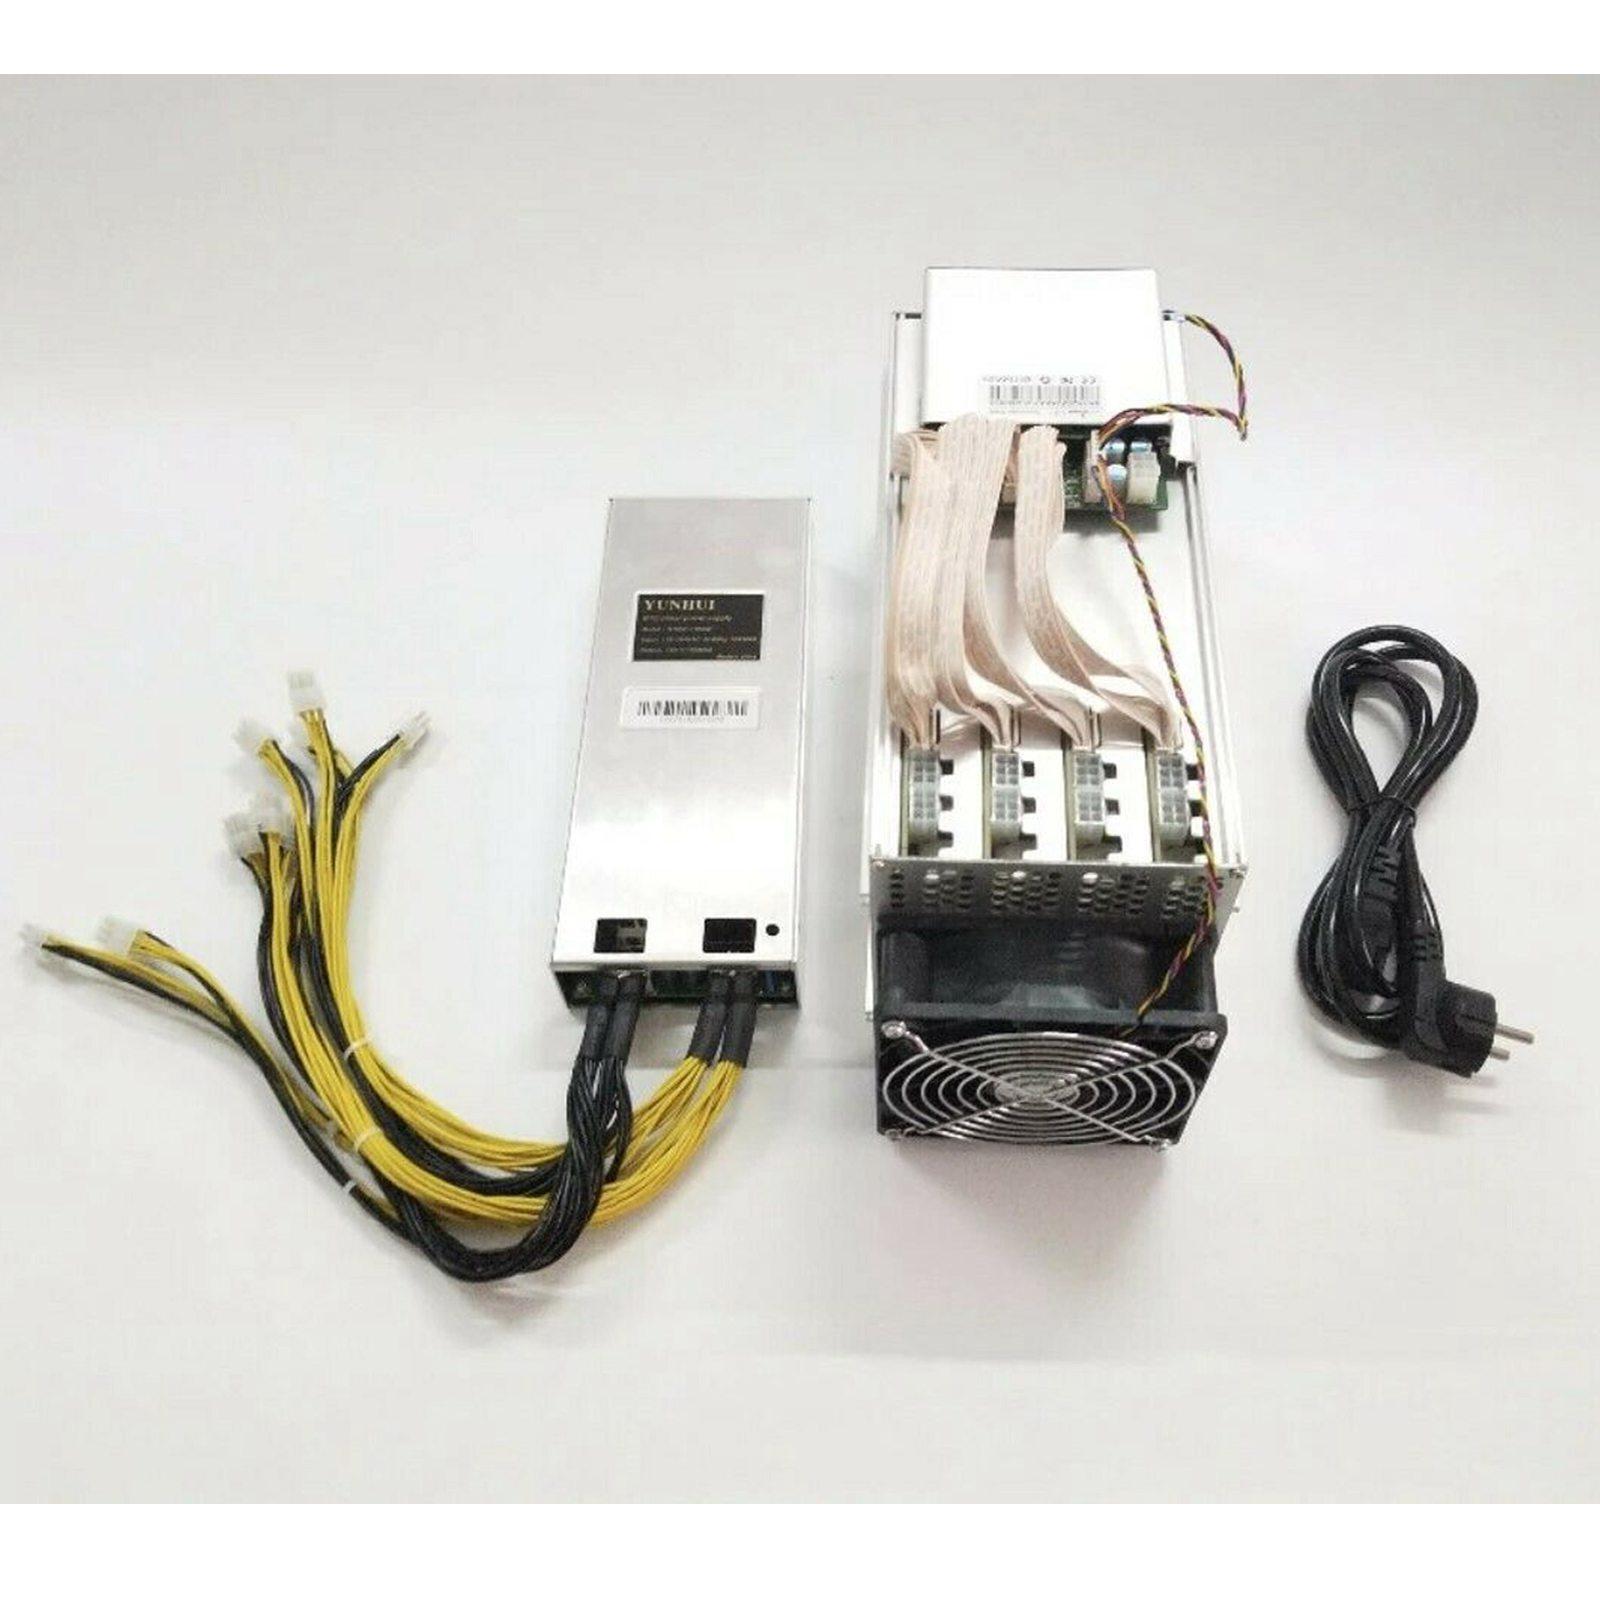 Used Scrypt Miner ANTMINER L3+ LTC 504M With BITMAIN APW3++ Plus PSU Miner Mining Card 110V-240V Black